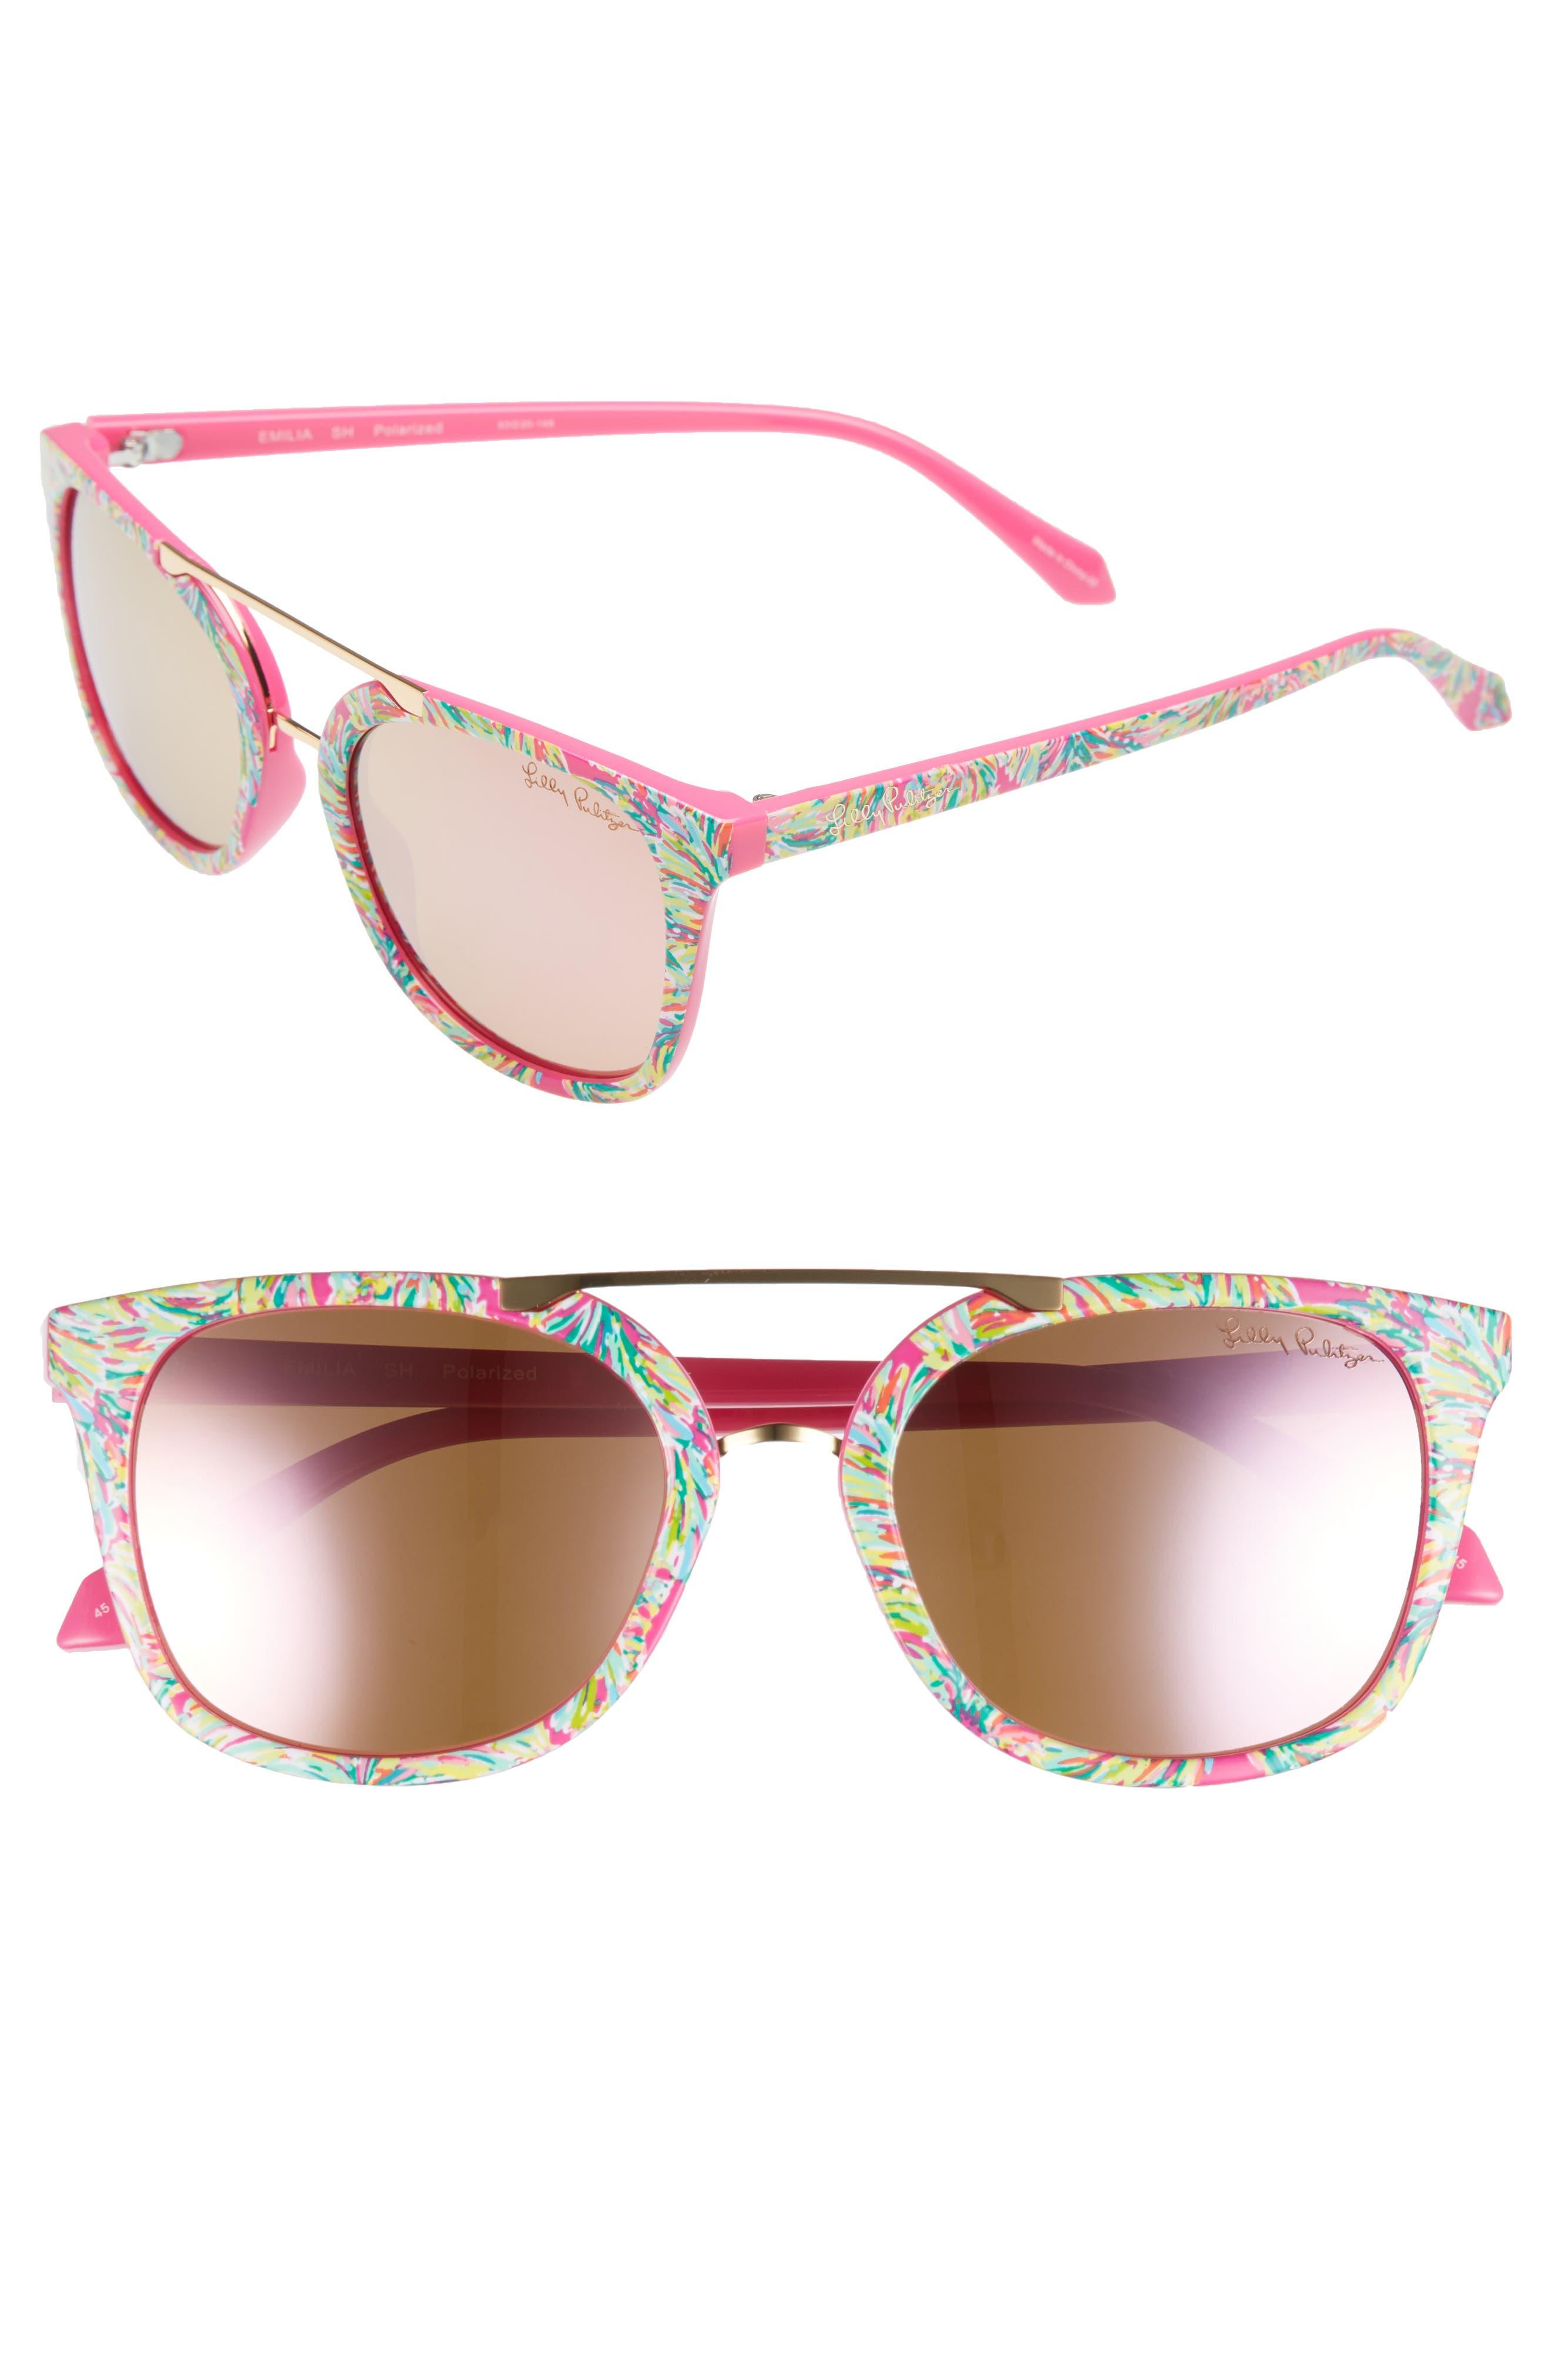 Lilly Pulitzer Emilia 53mm Polarized Sunglasses,                             Main thumbnail 1, color,                             Shady Lady/ Pink